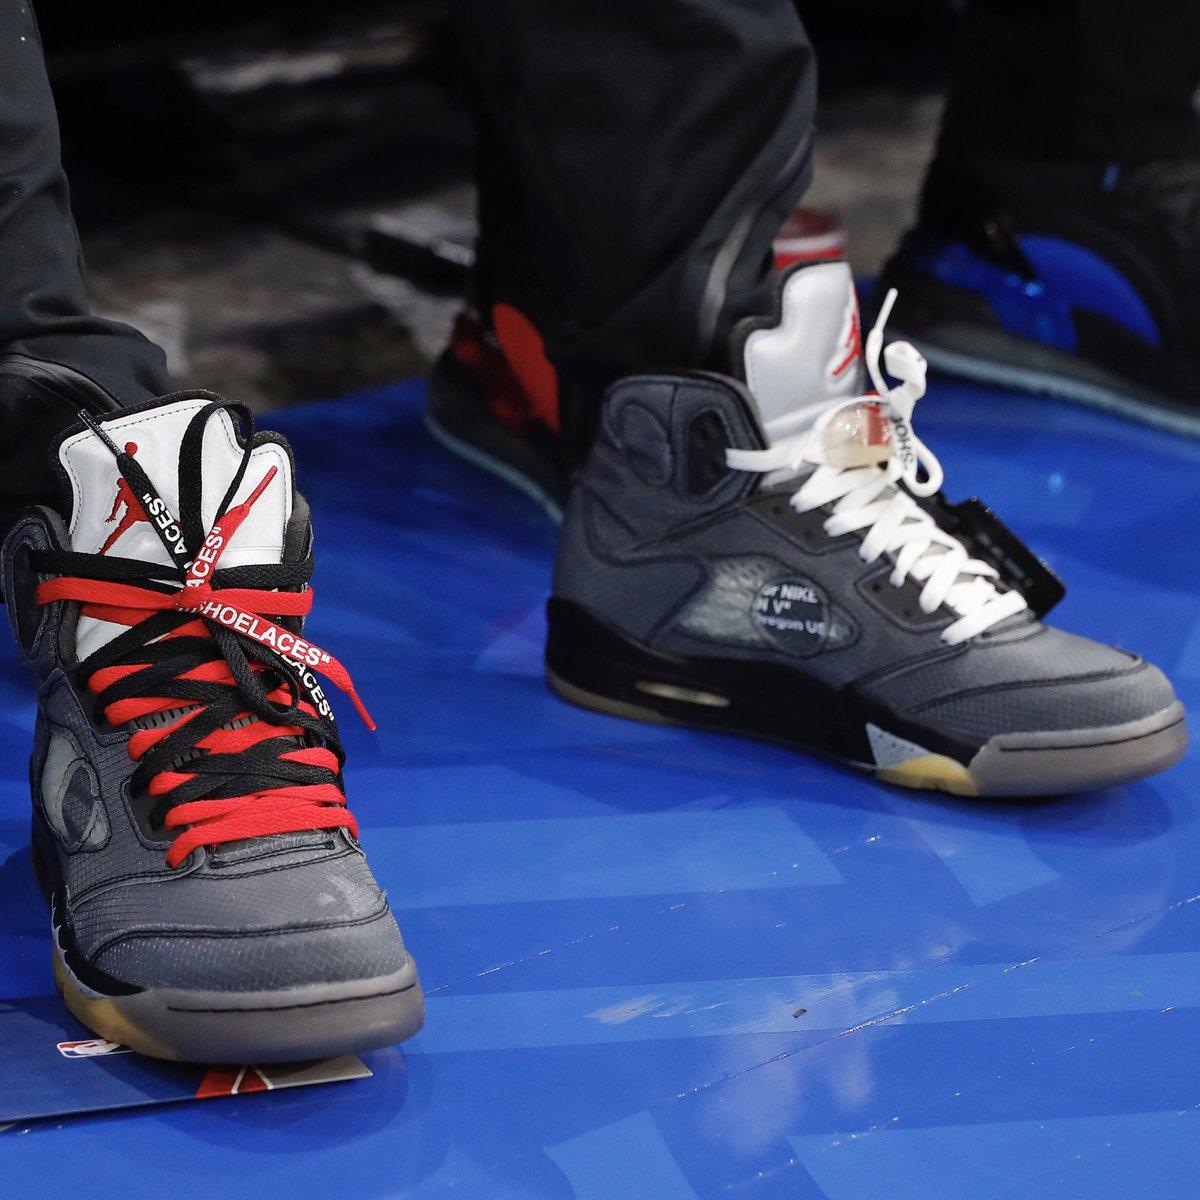 #NBACelebRow 🔥   @neymarjr courtside in Paris wearing Off-White Air Jordan 5's! #NBAKicks